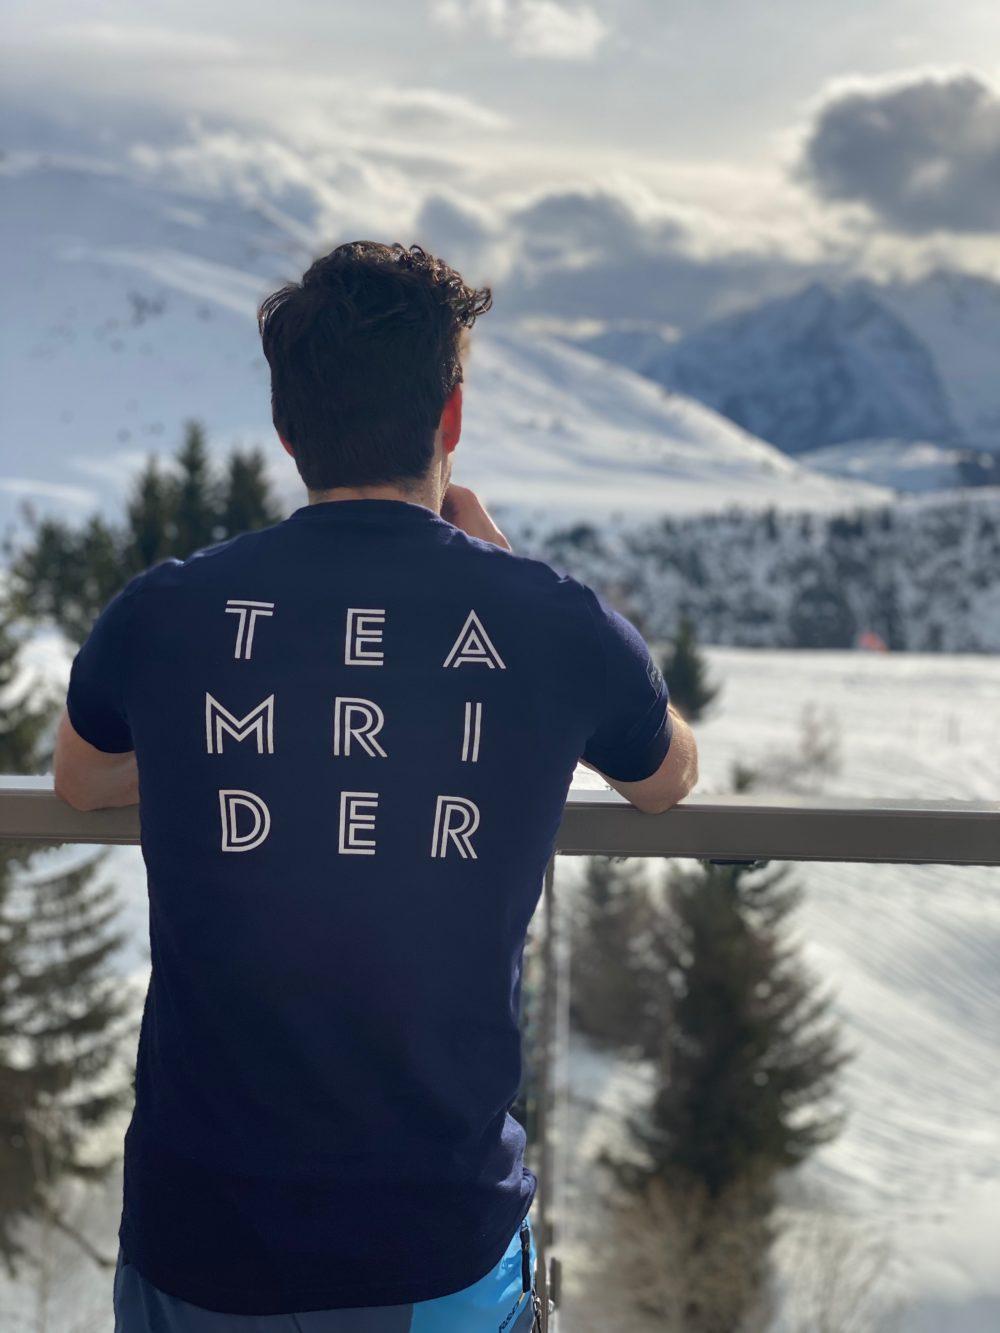 Double Dutch on tour | Teamrider Thijs van Os | Double Dutch Mountain Events